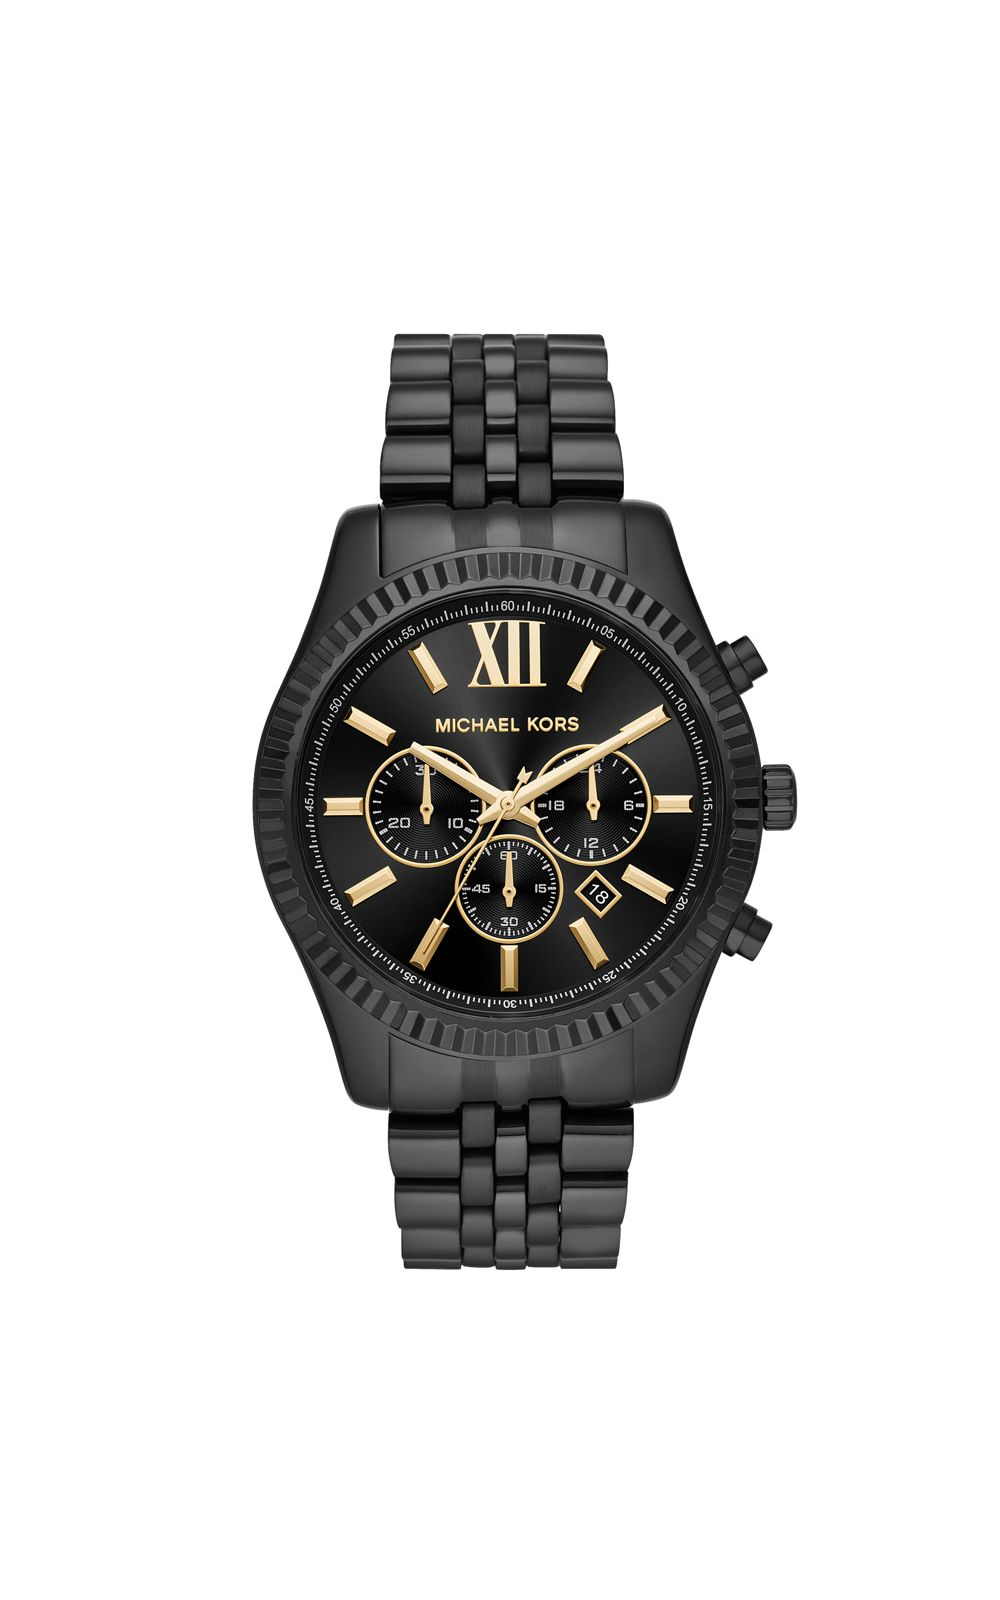 21348a1efef Relógio Michael Kors Feminino Essential Lexington Preto - MK8603 1PN.  undefined